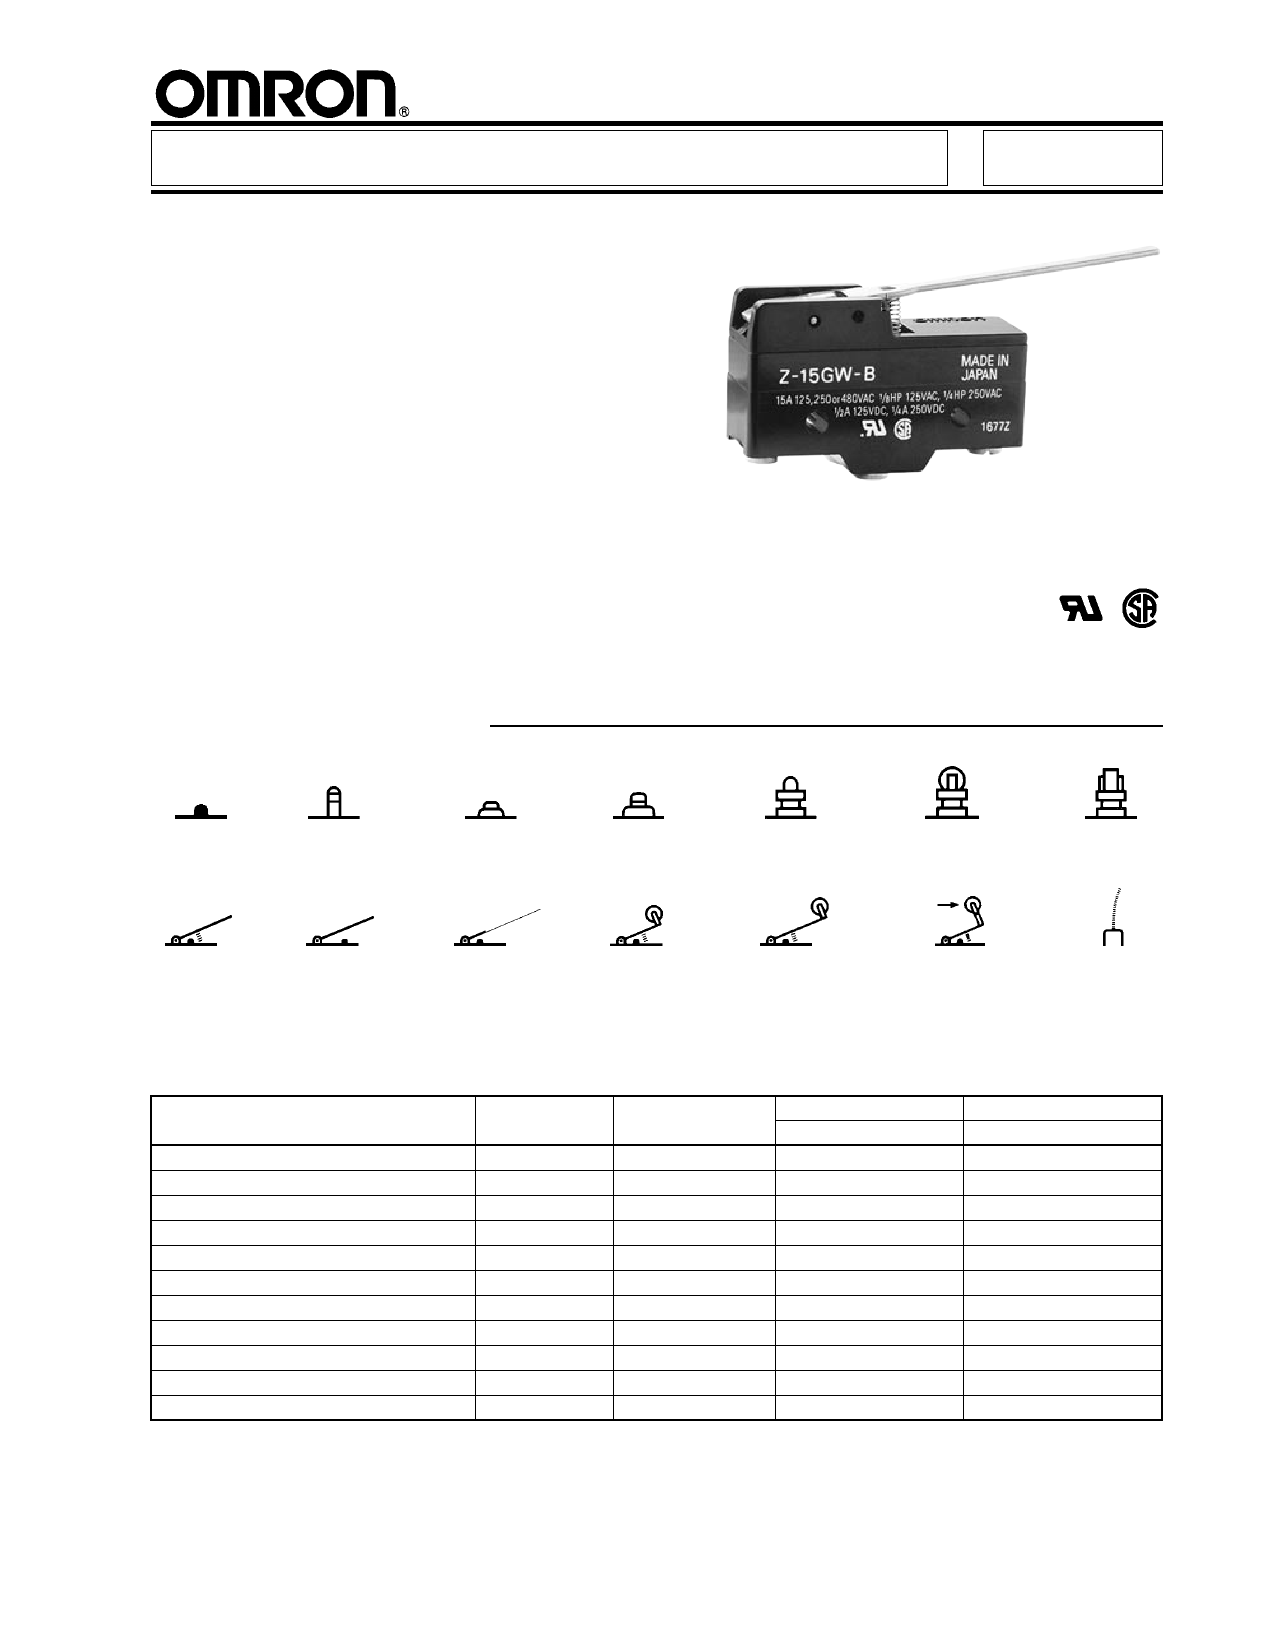 Z-15GW2-B datasheet